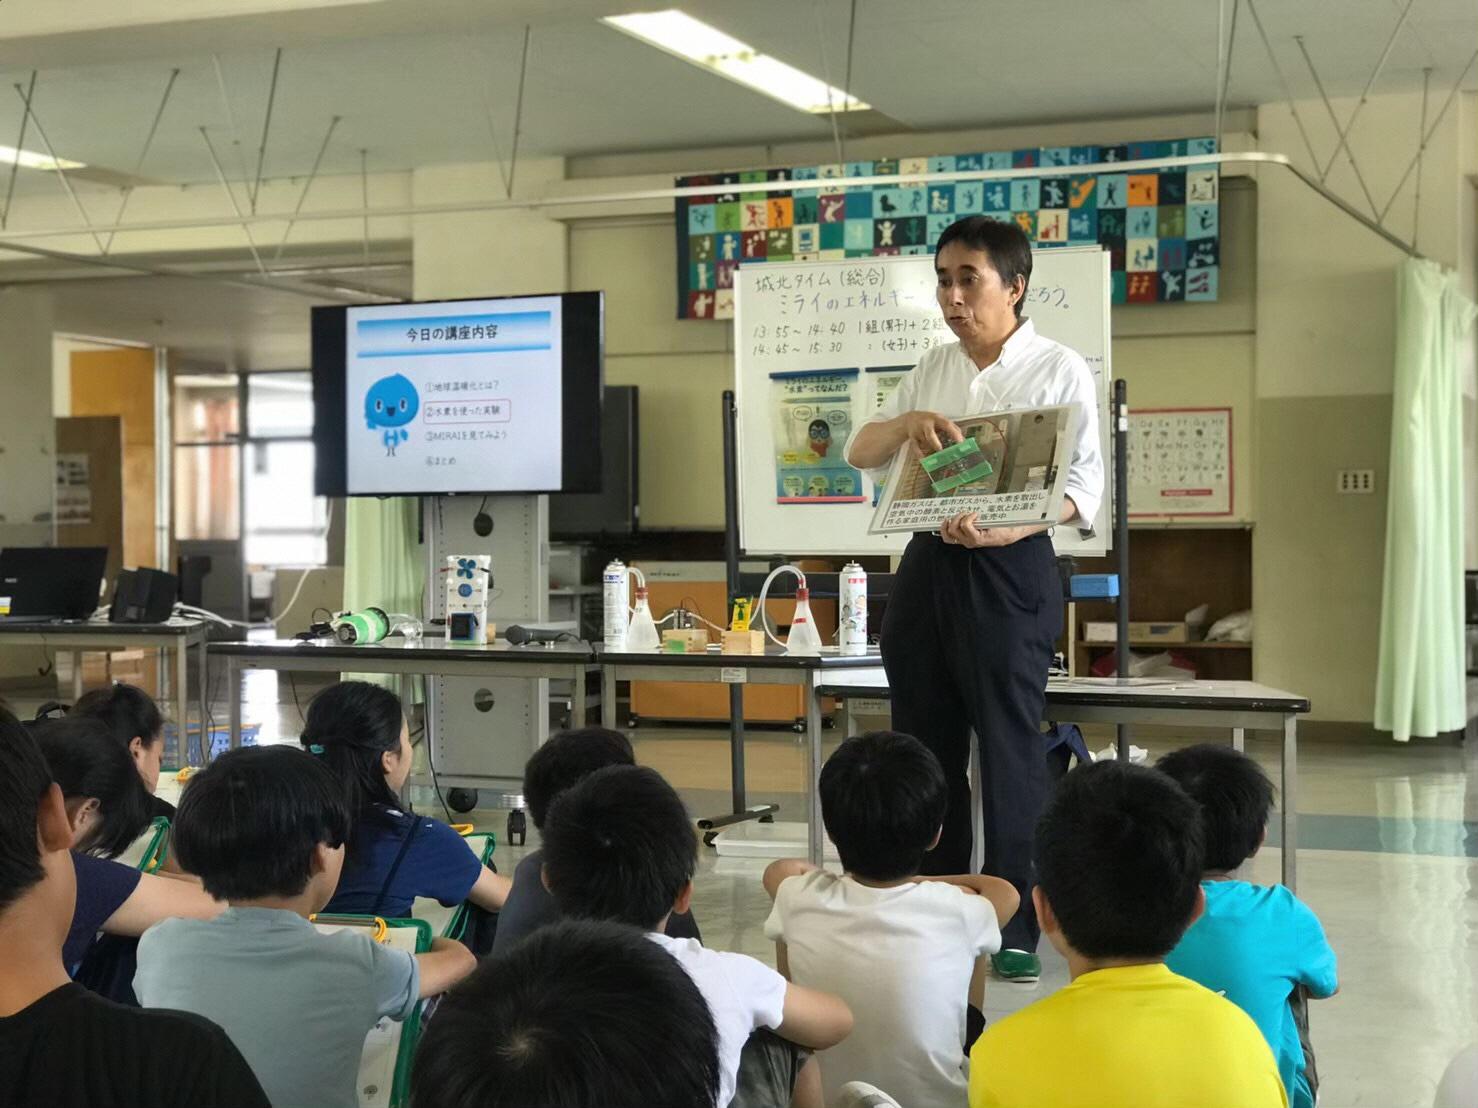 http://www.shizutan.jp/ondanka/event/2020/01/06/images/IMG-3973.JPG